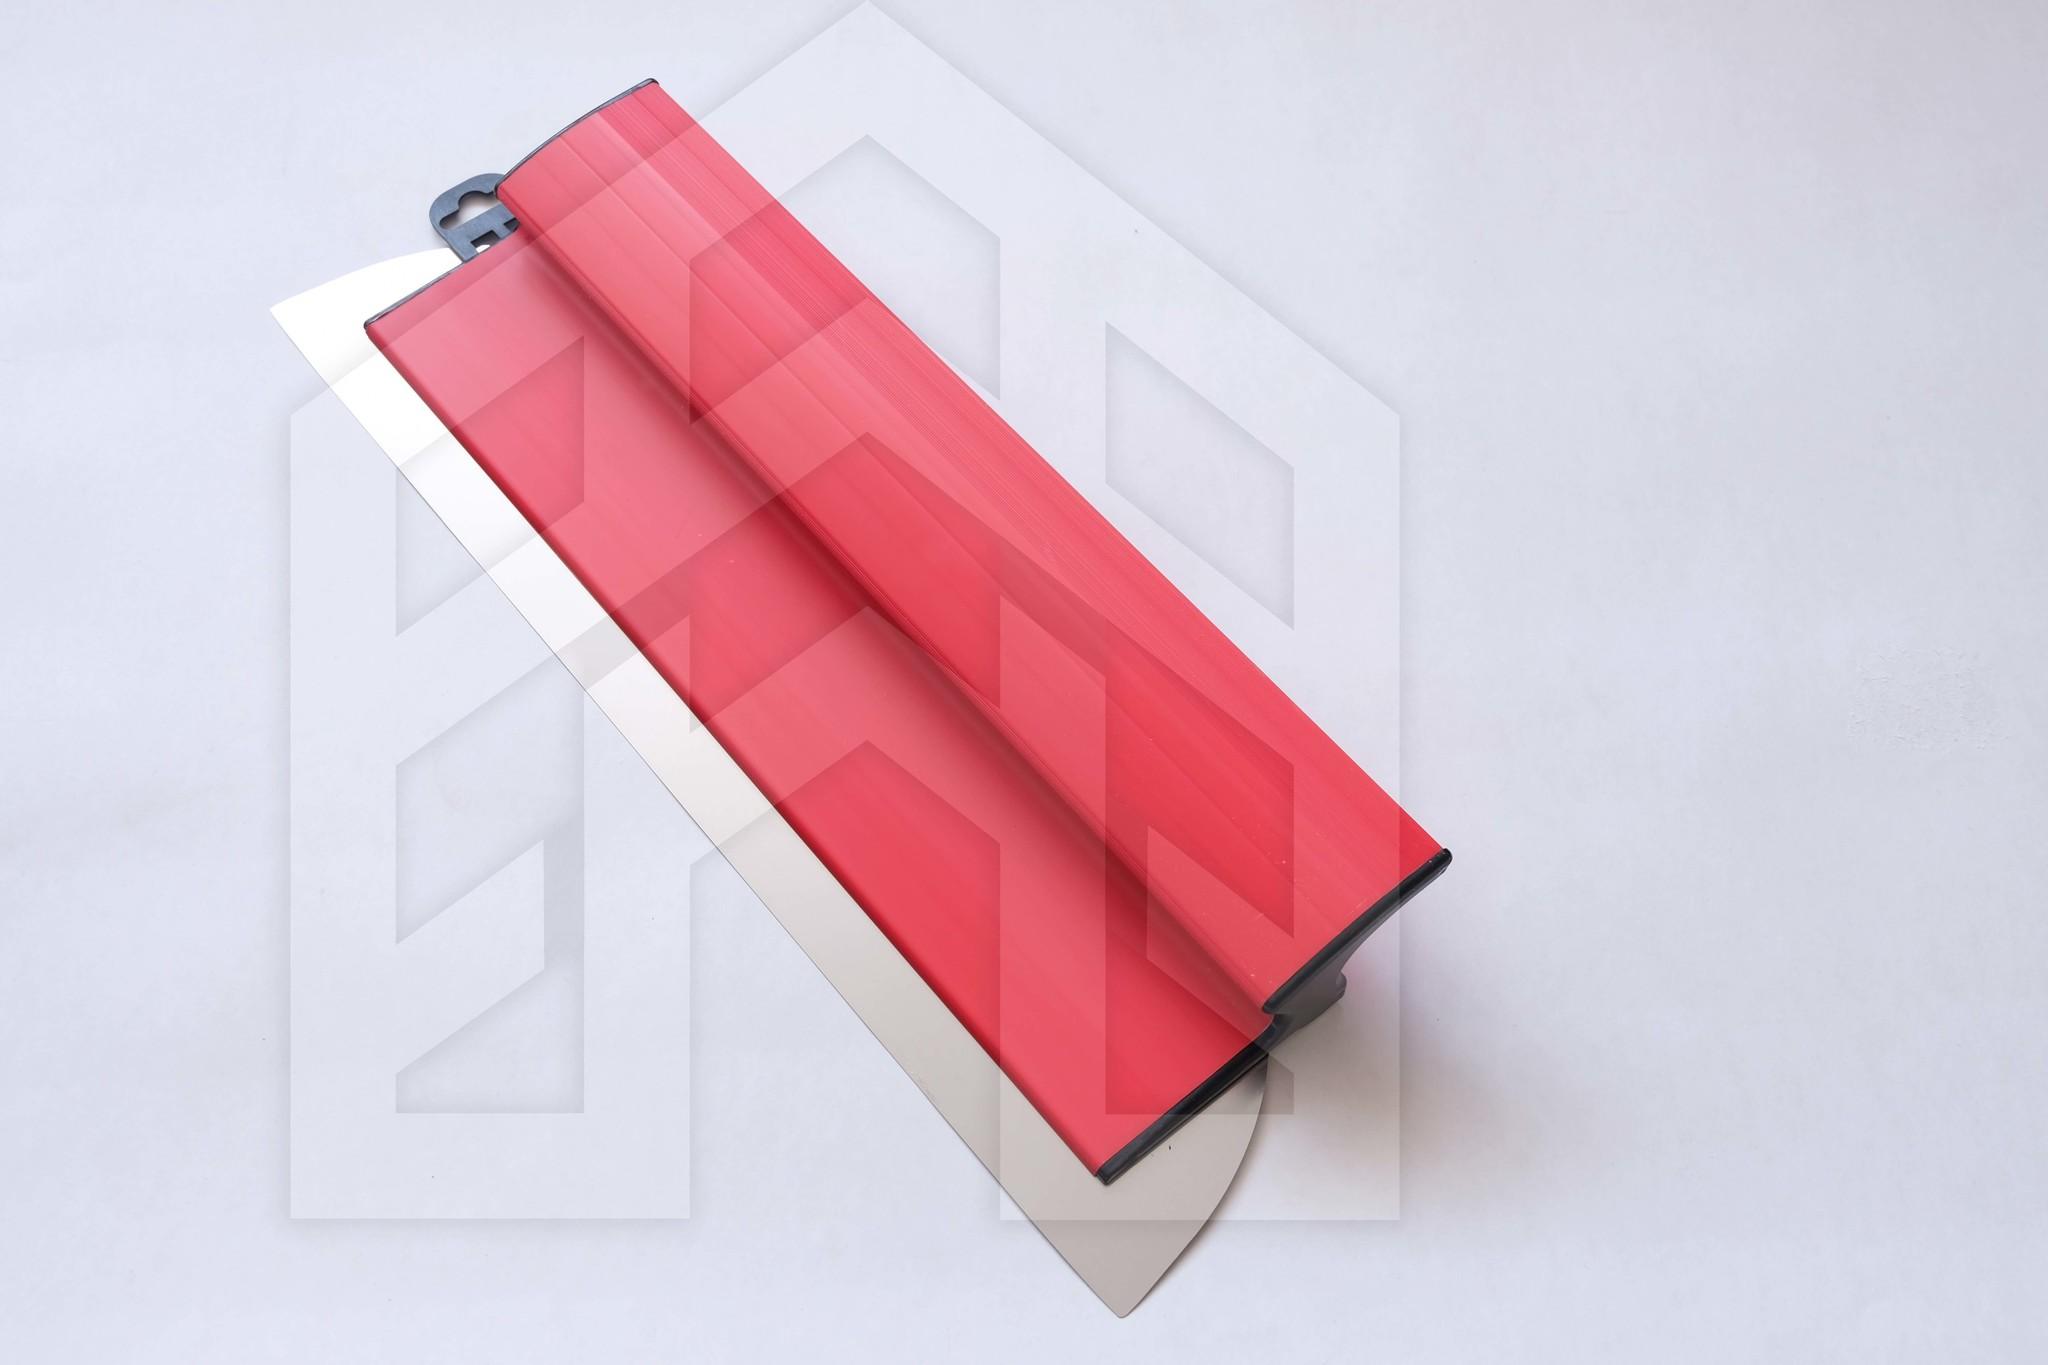 Home of Concrete HoC Glatte Kelle | Stainless Steel Pro  - 450mm